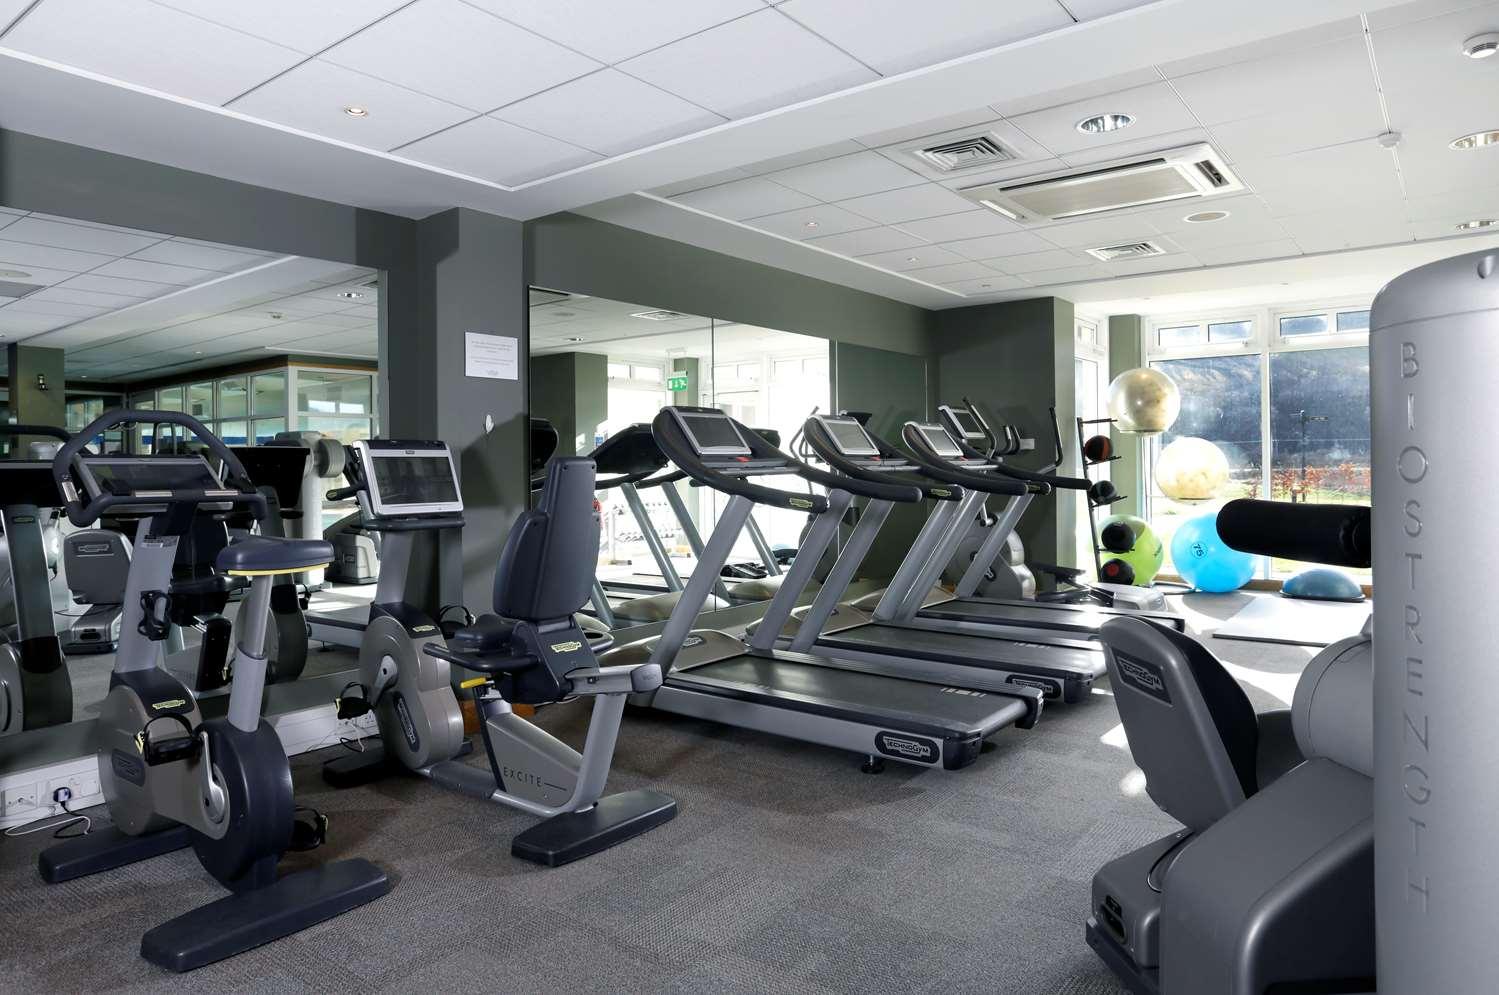 Cardrona Gym